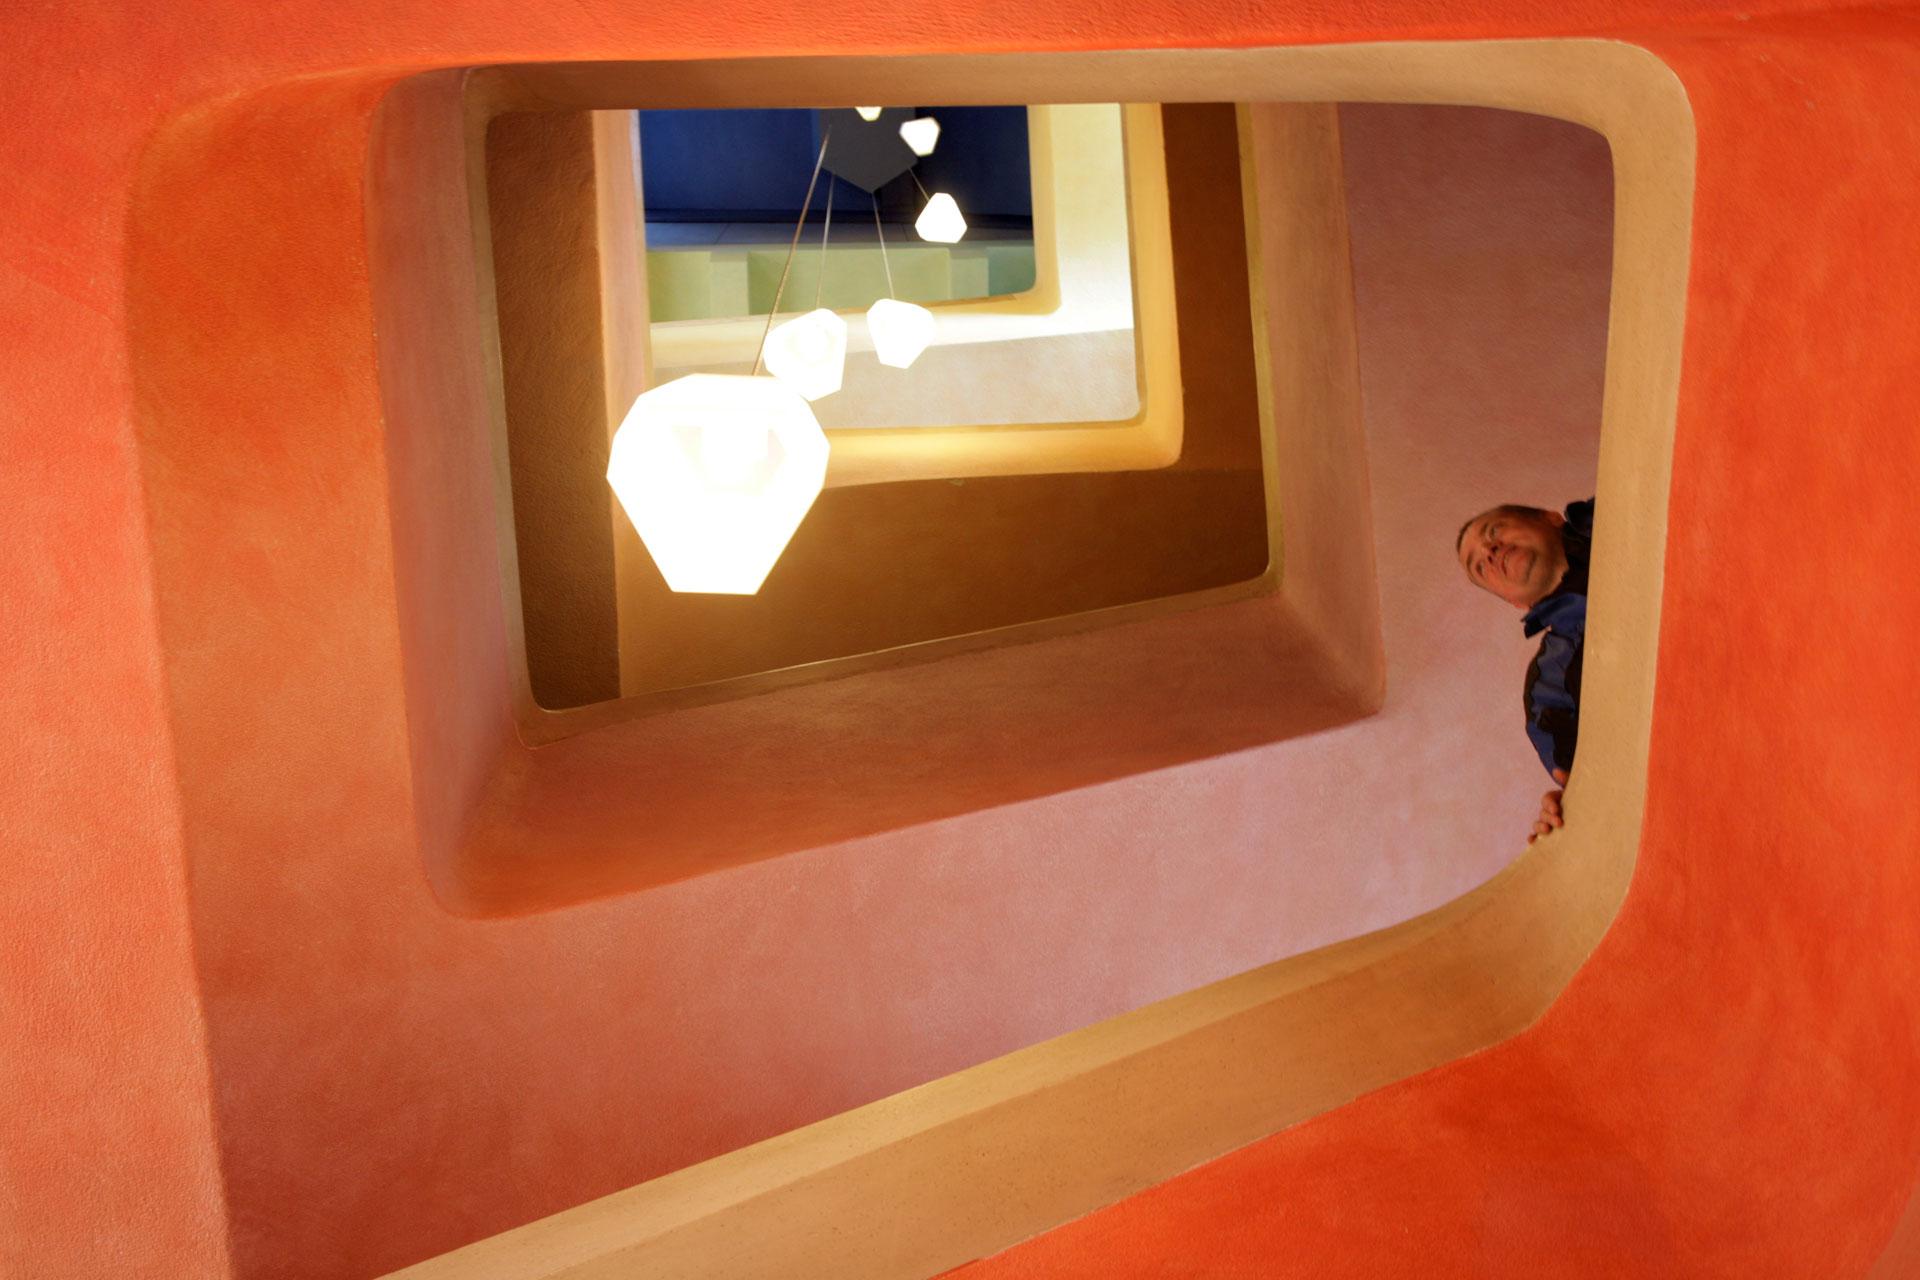 Südtreppenhaus – South staircase